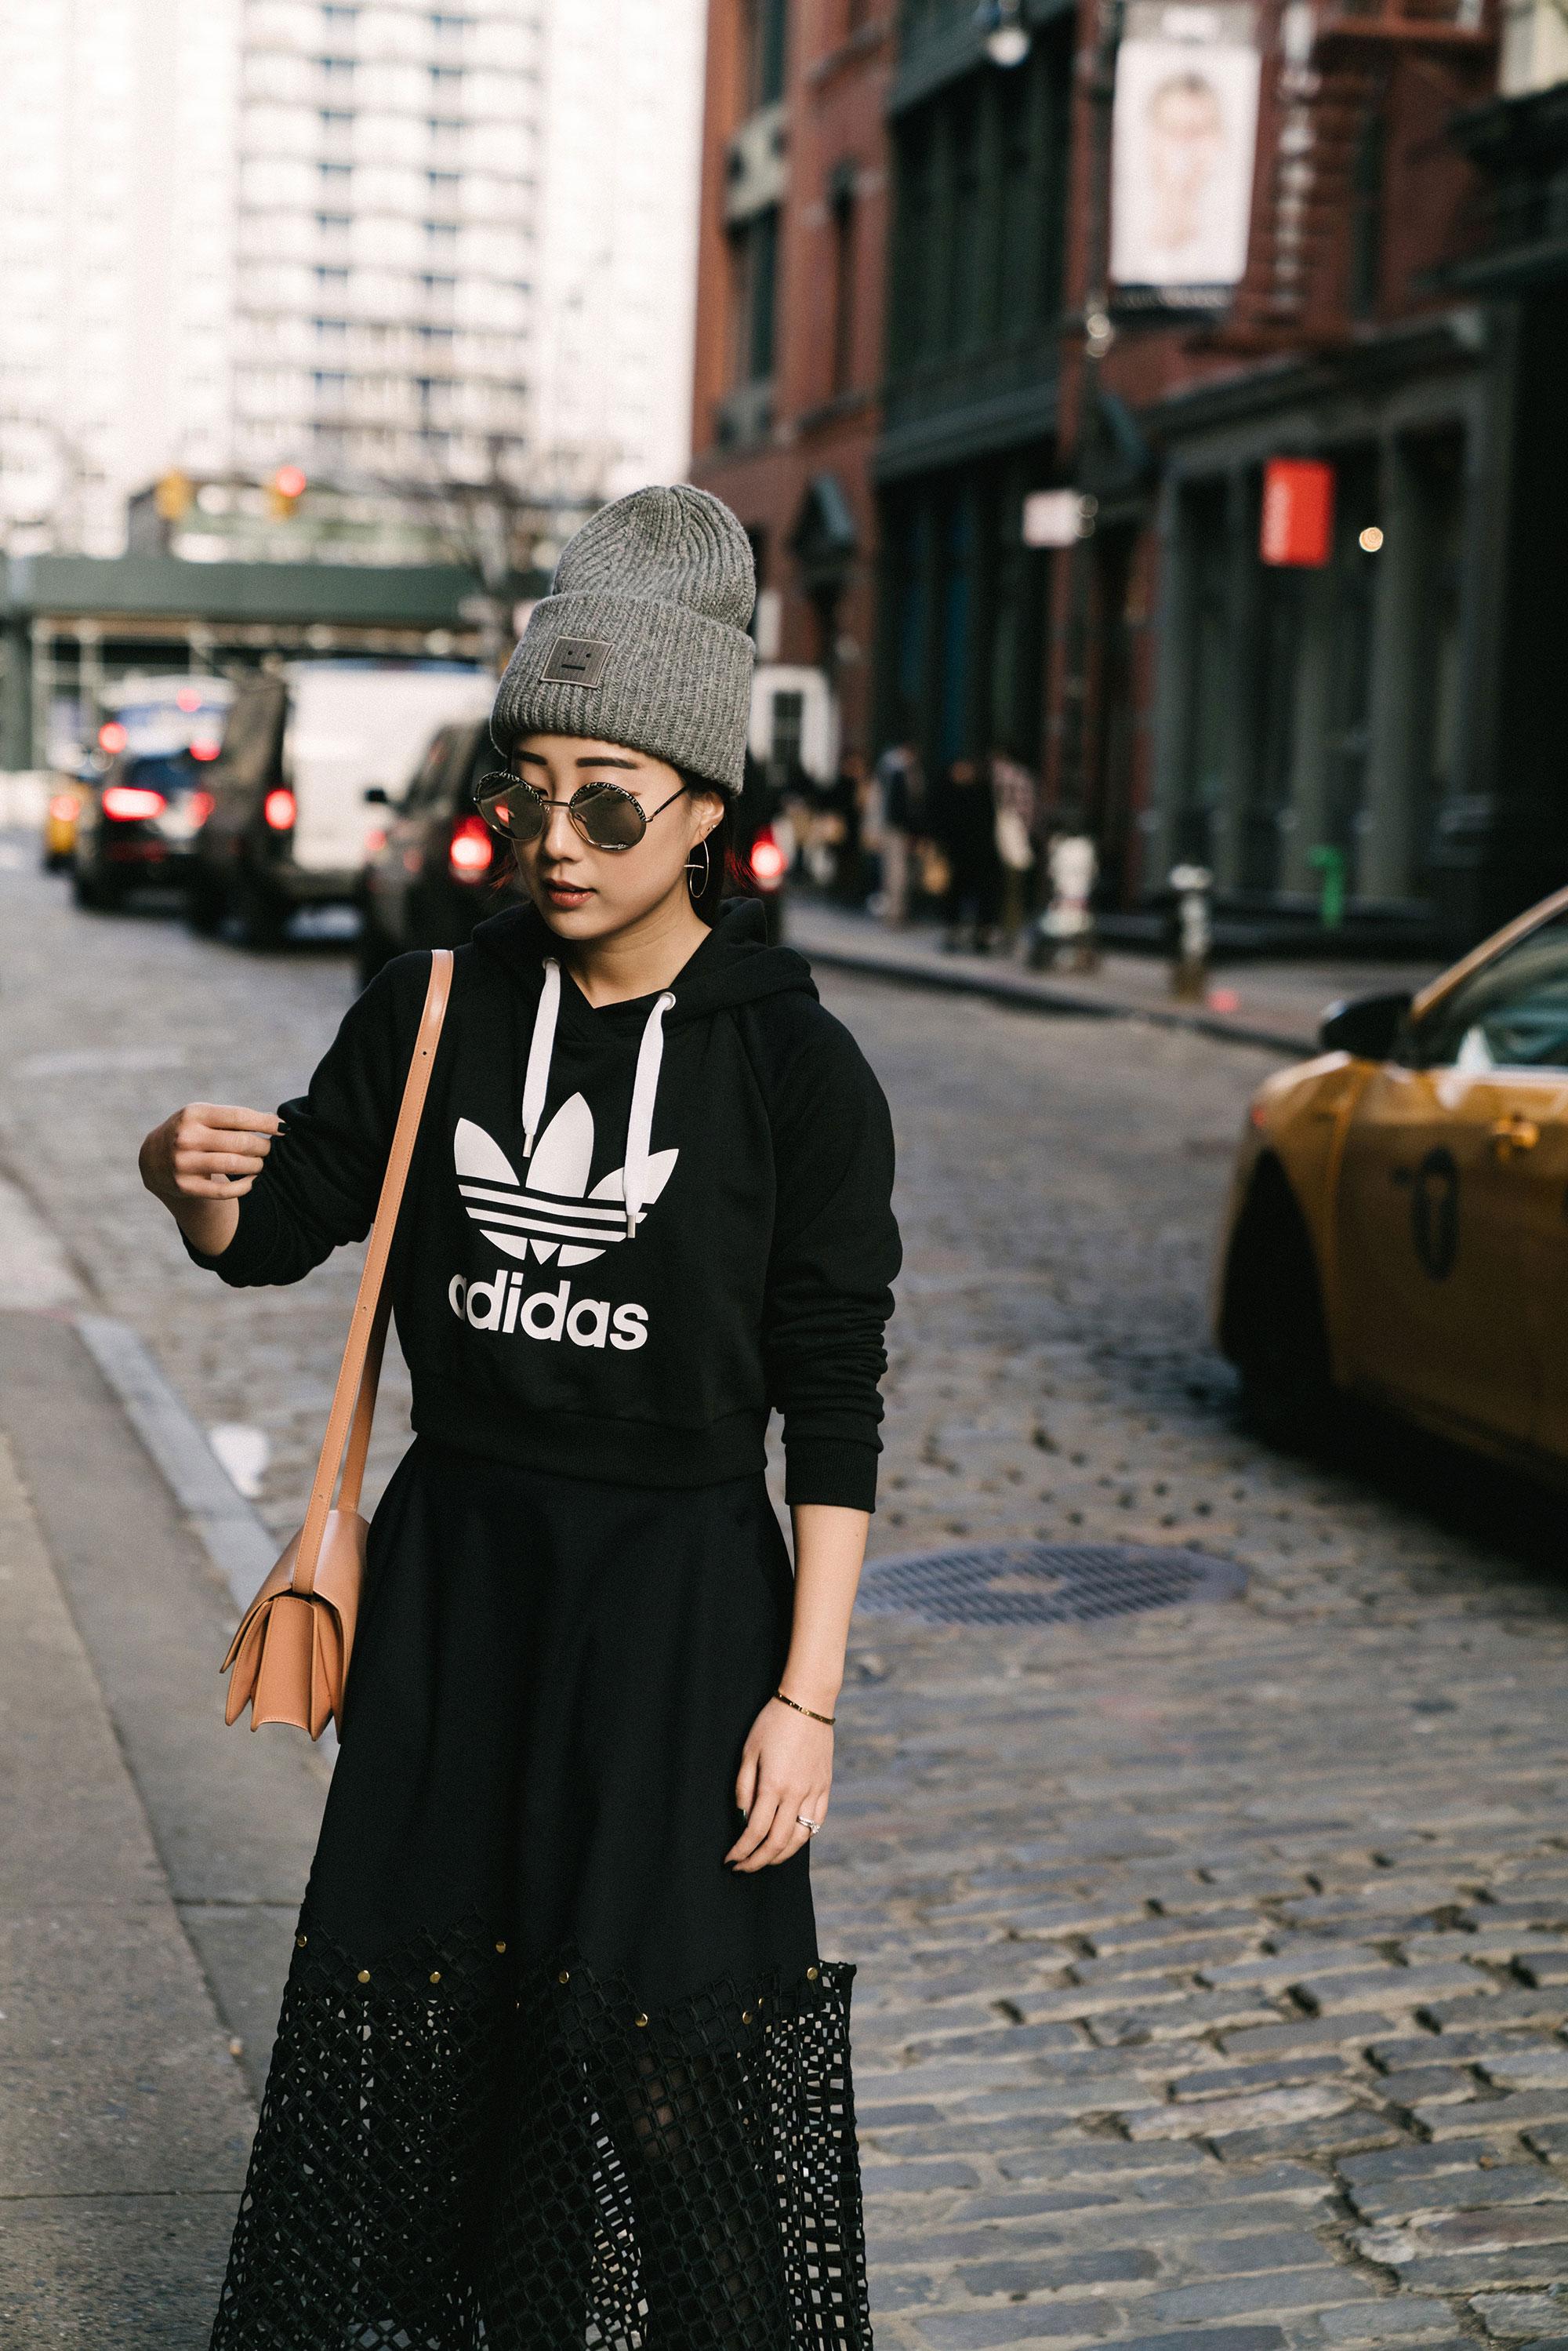 adidas Top , Kolor Skirt,  Céline Bag ,  Acne Studios Hat , Cutler and Gross Sunglasses, Cartier Bracelet,  Hirotaka Earrings